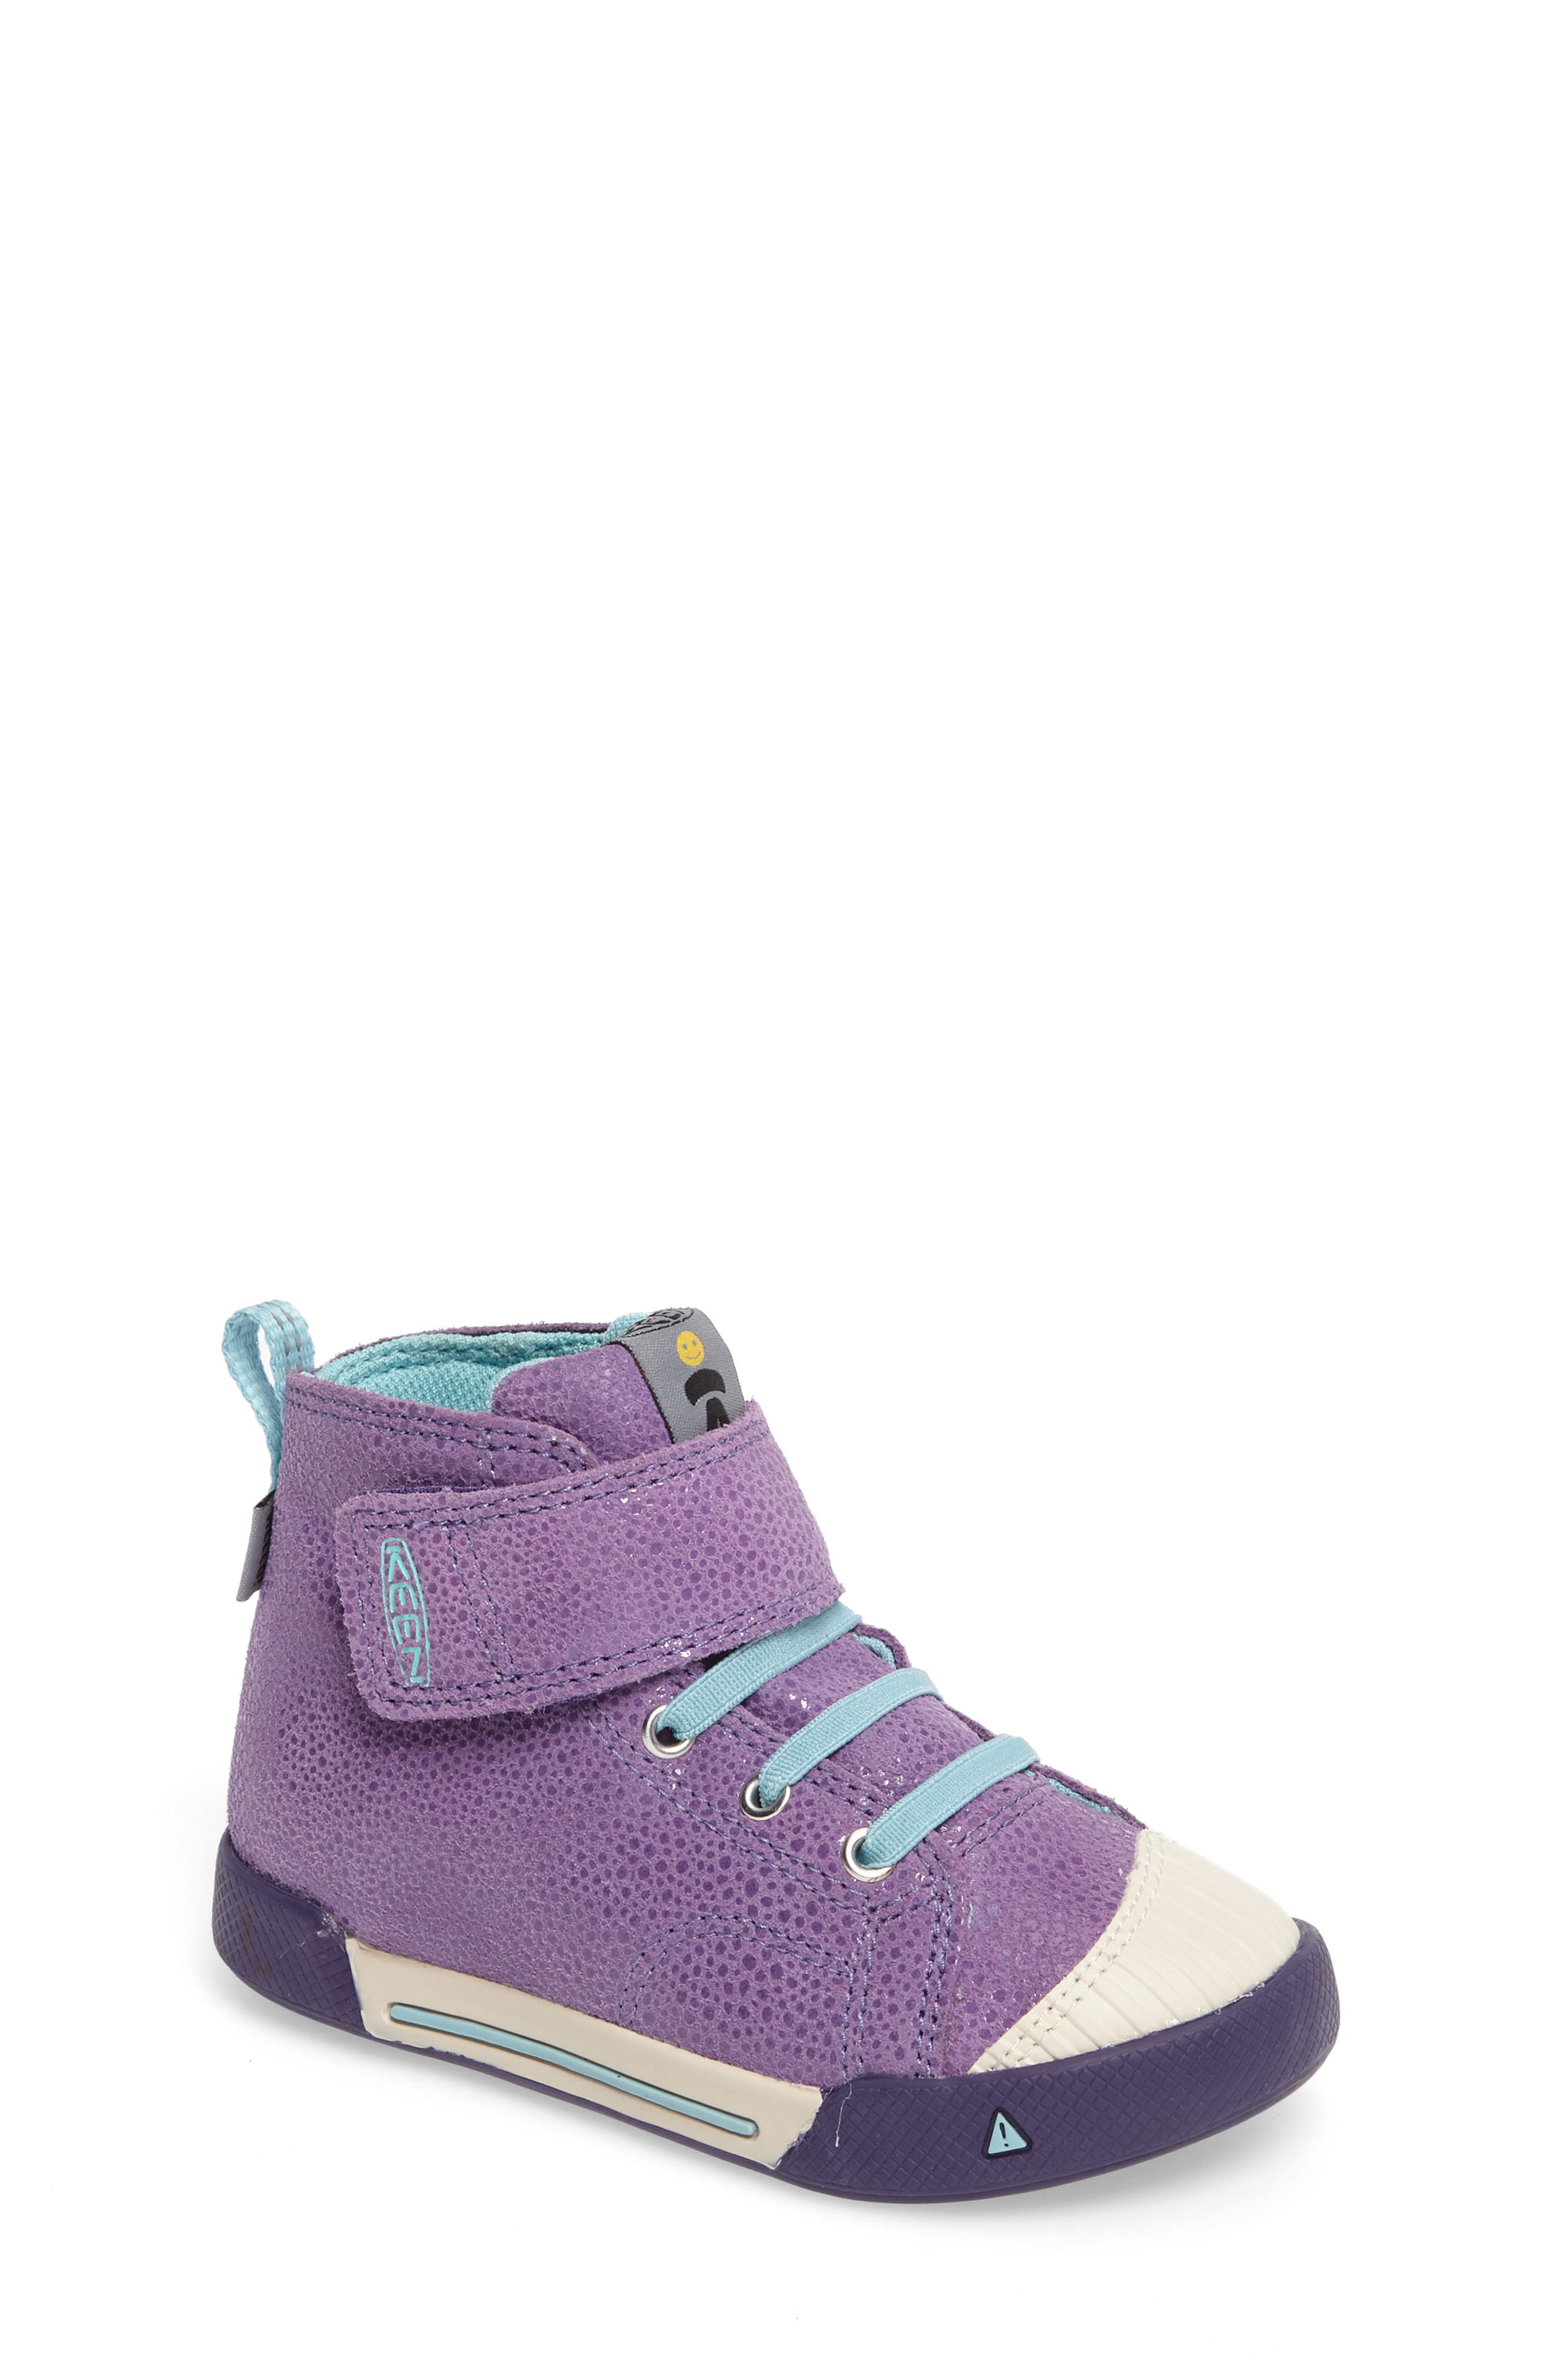 Alternate Image 1 Selected - Keen 'Encanto Scout' High Top Sneaker (Baby, Walker, Toddler & Little Kid)